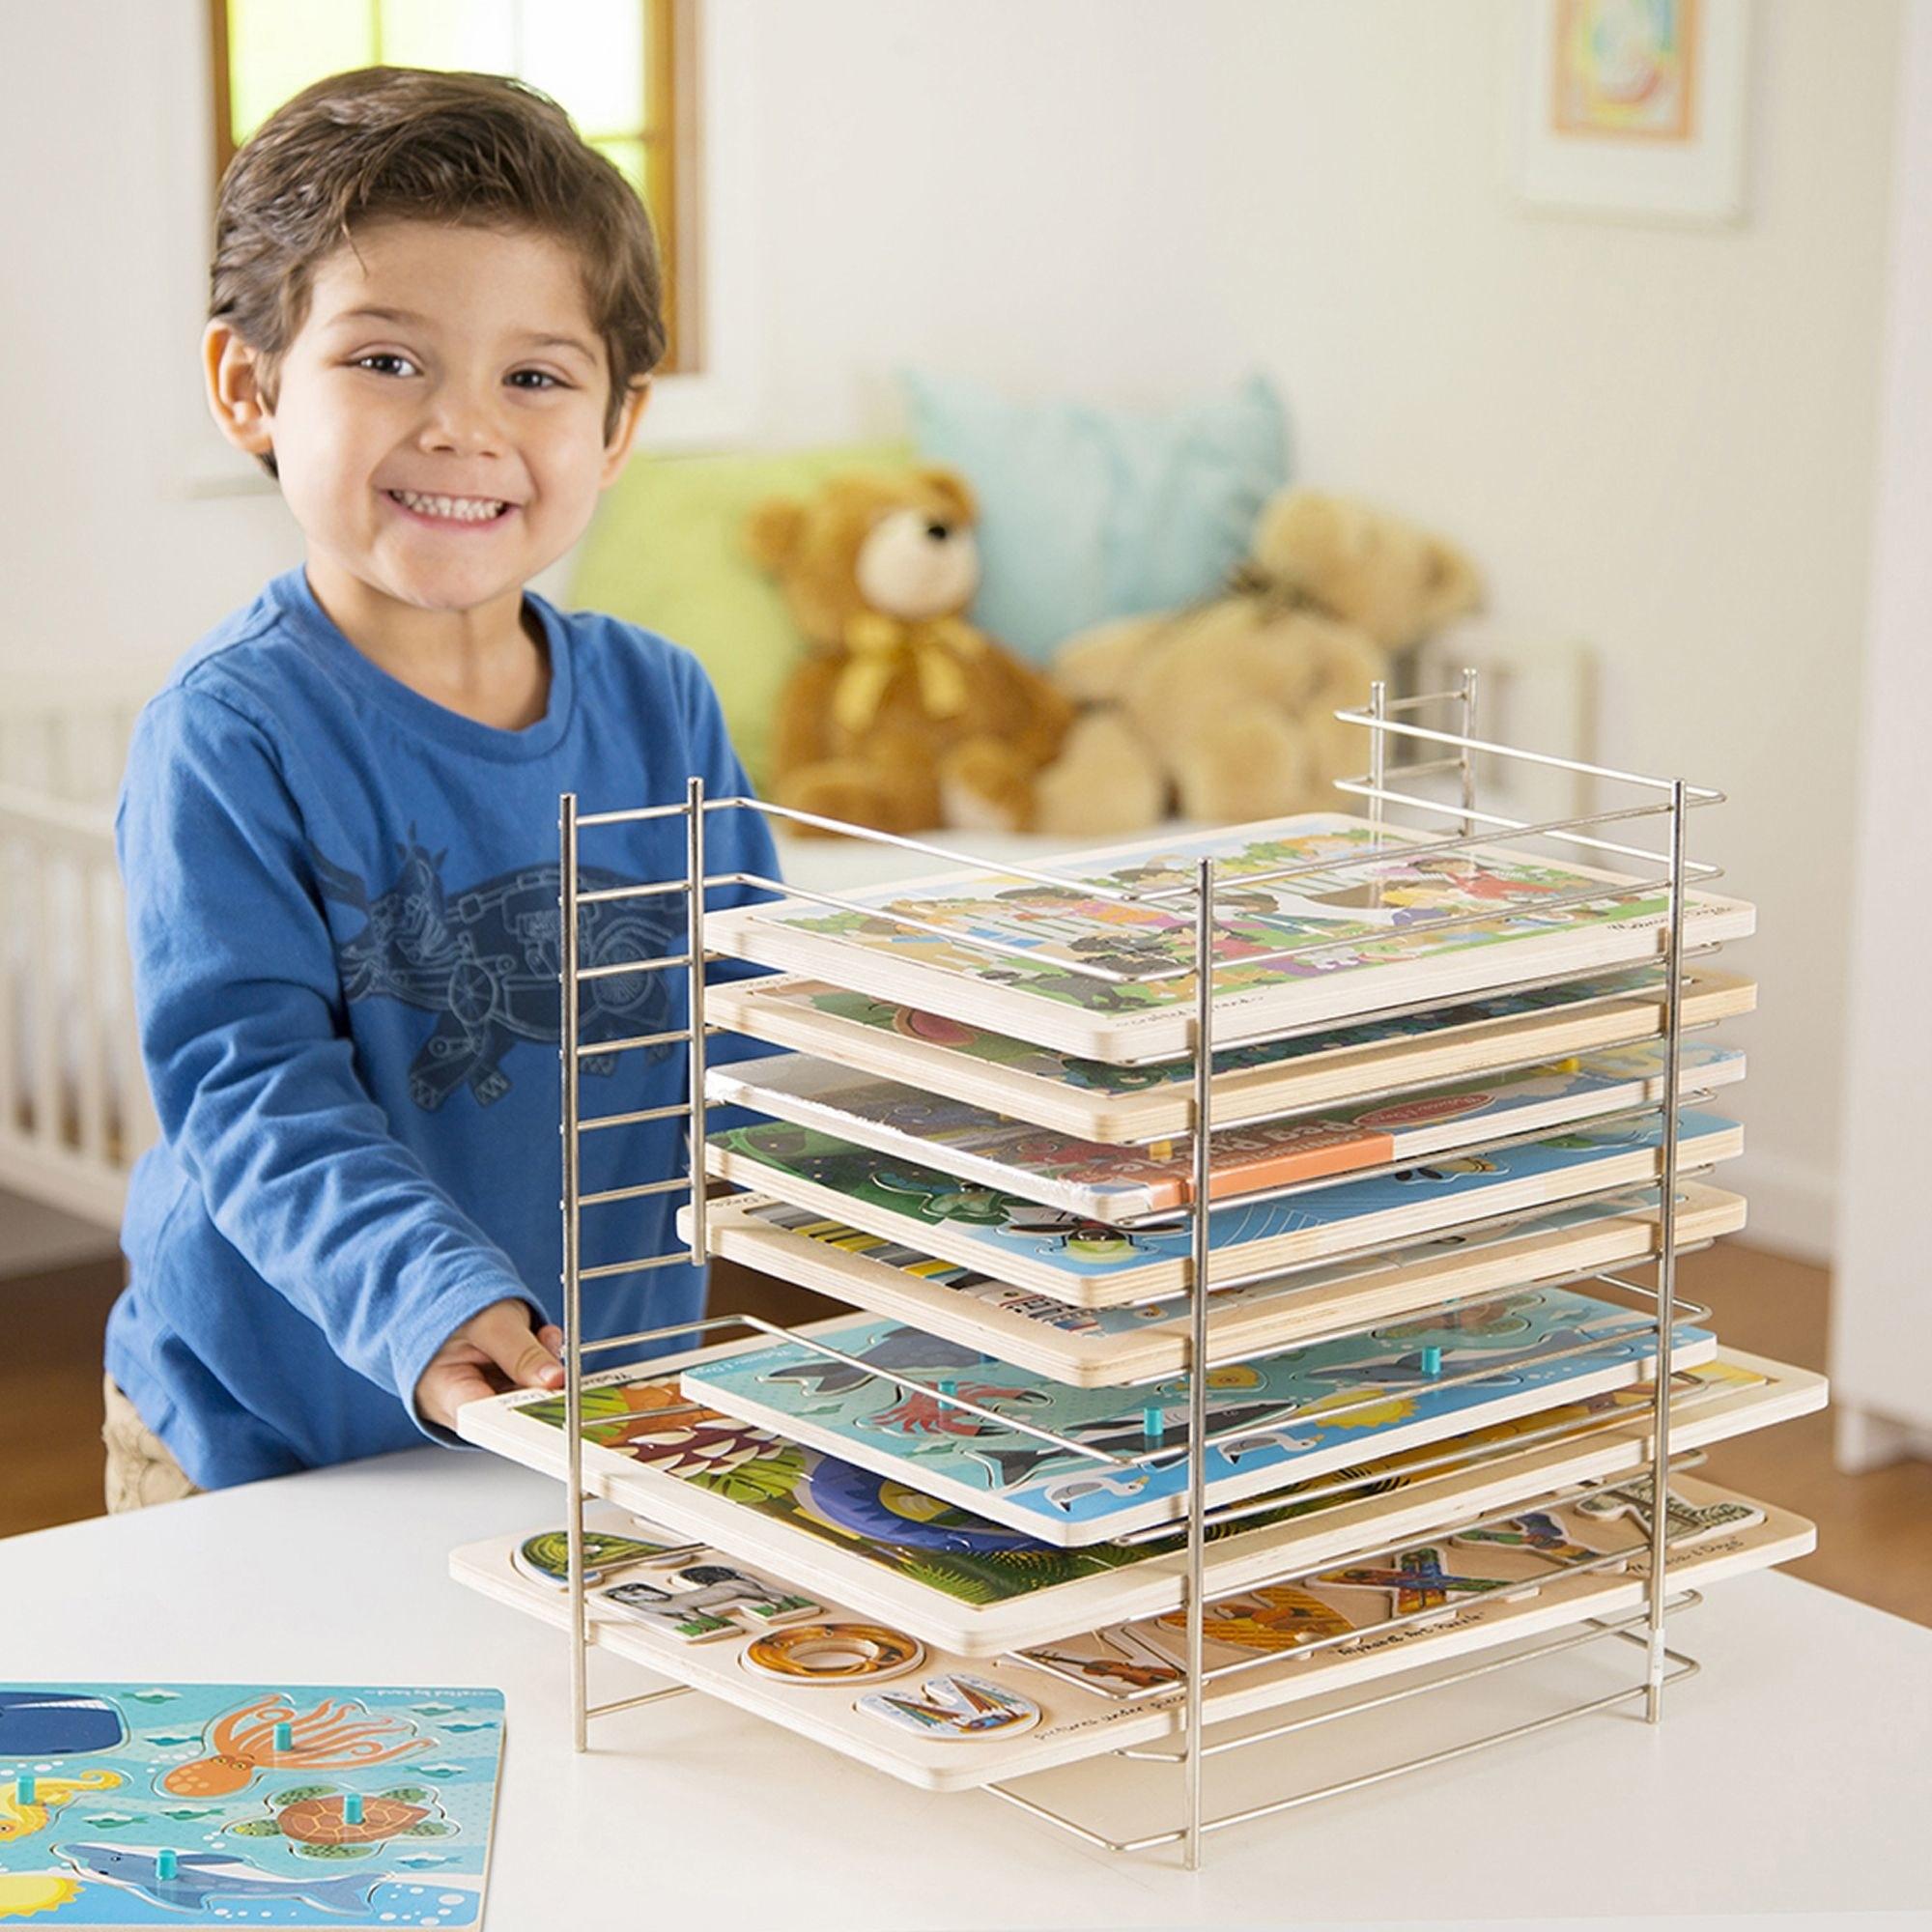 Model uses the metal puzzle storage rack